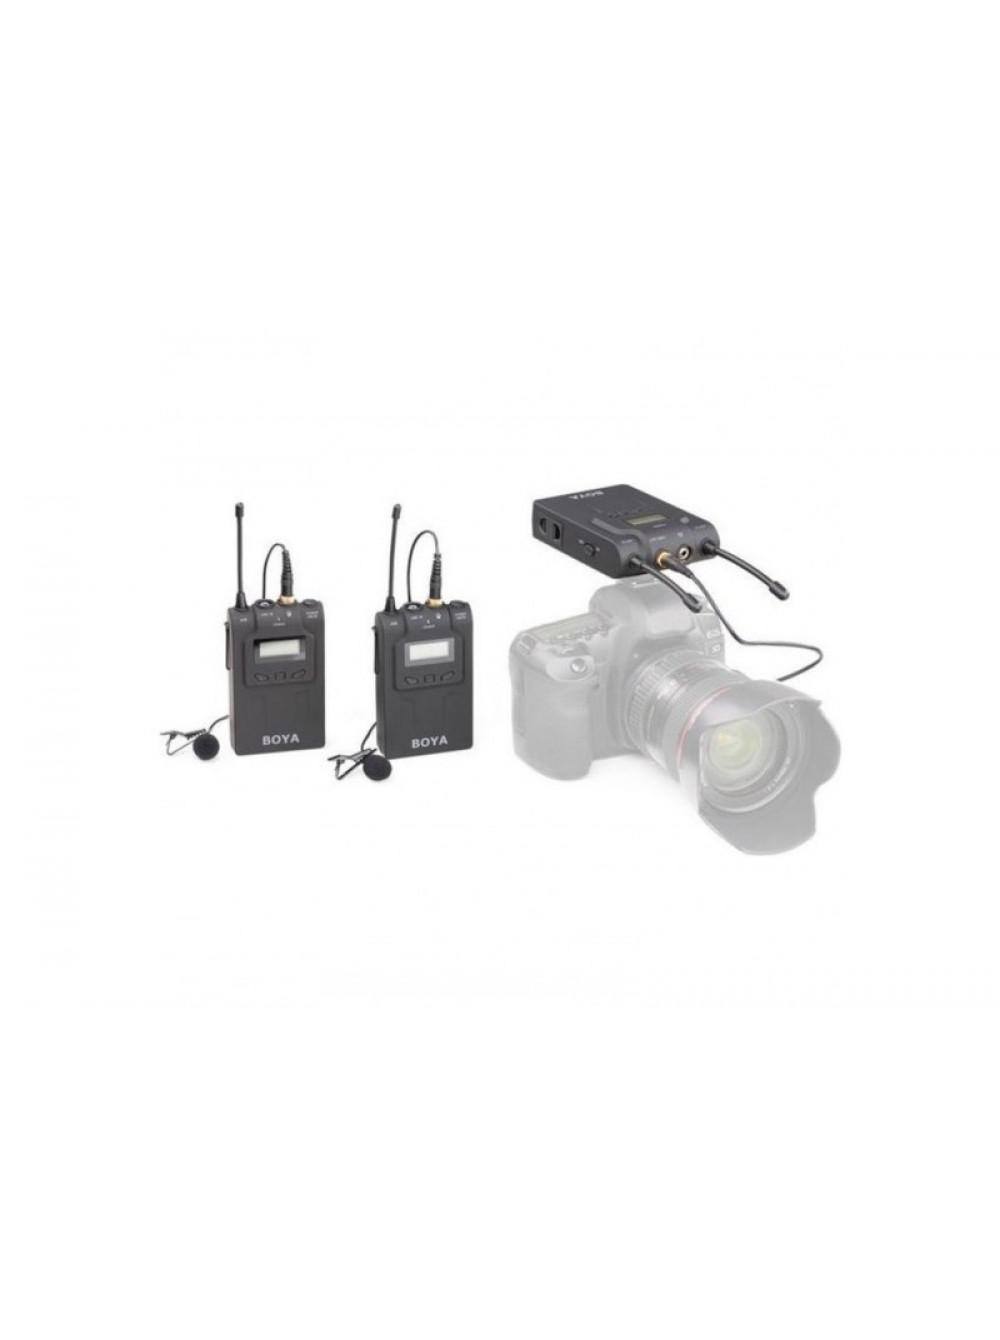 Радиомикрофонная система Boya BY-WM8 Pro-K2